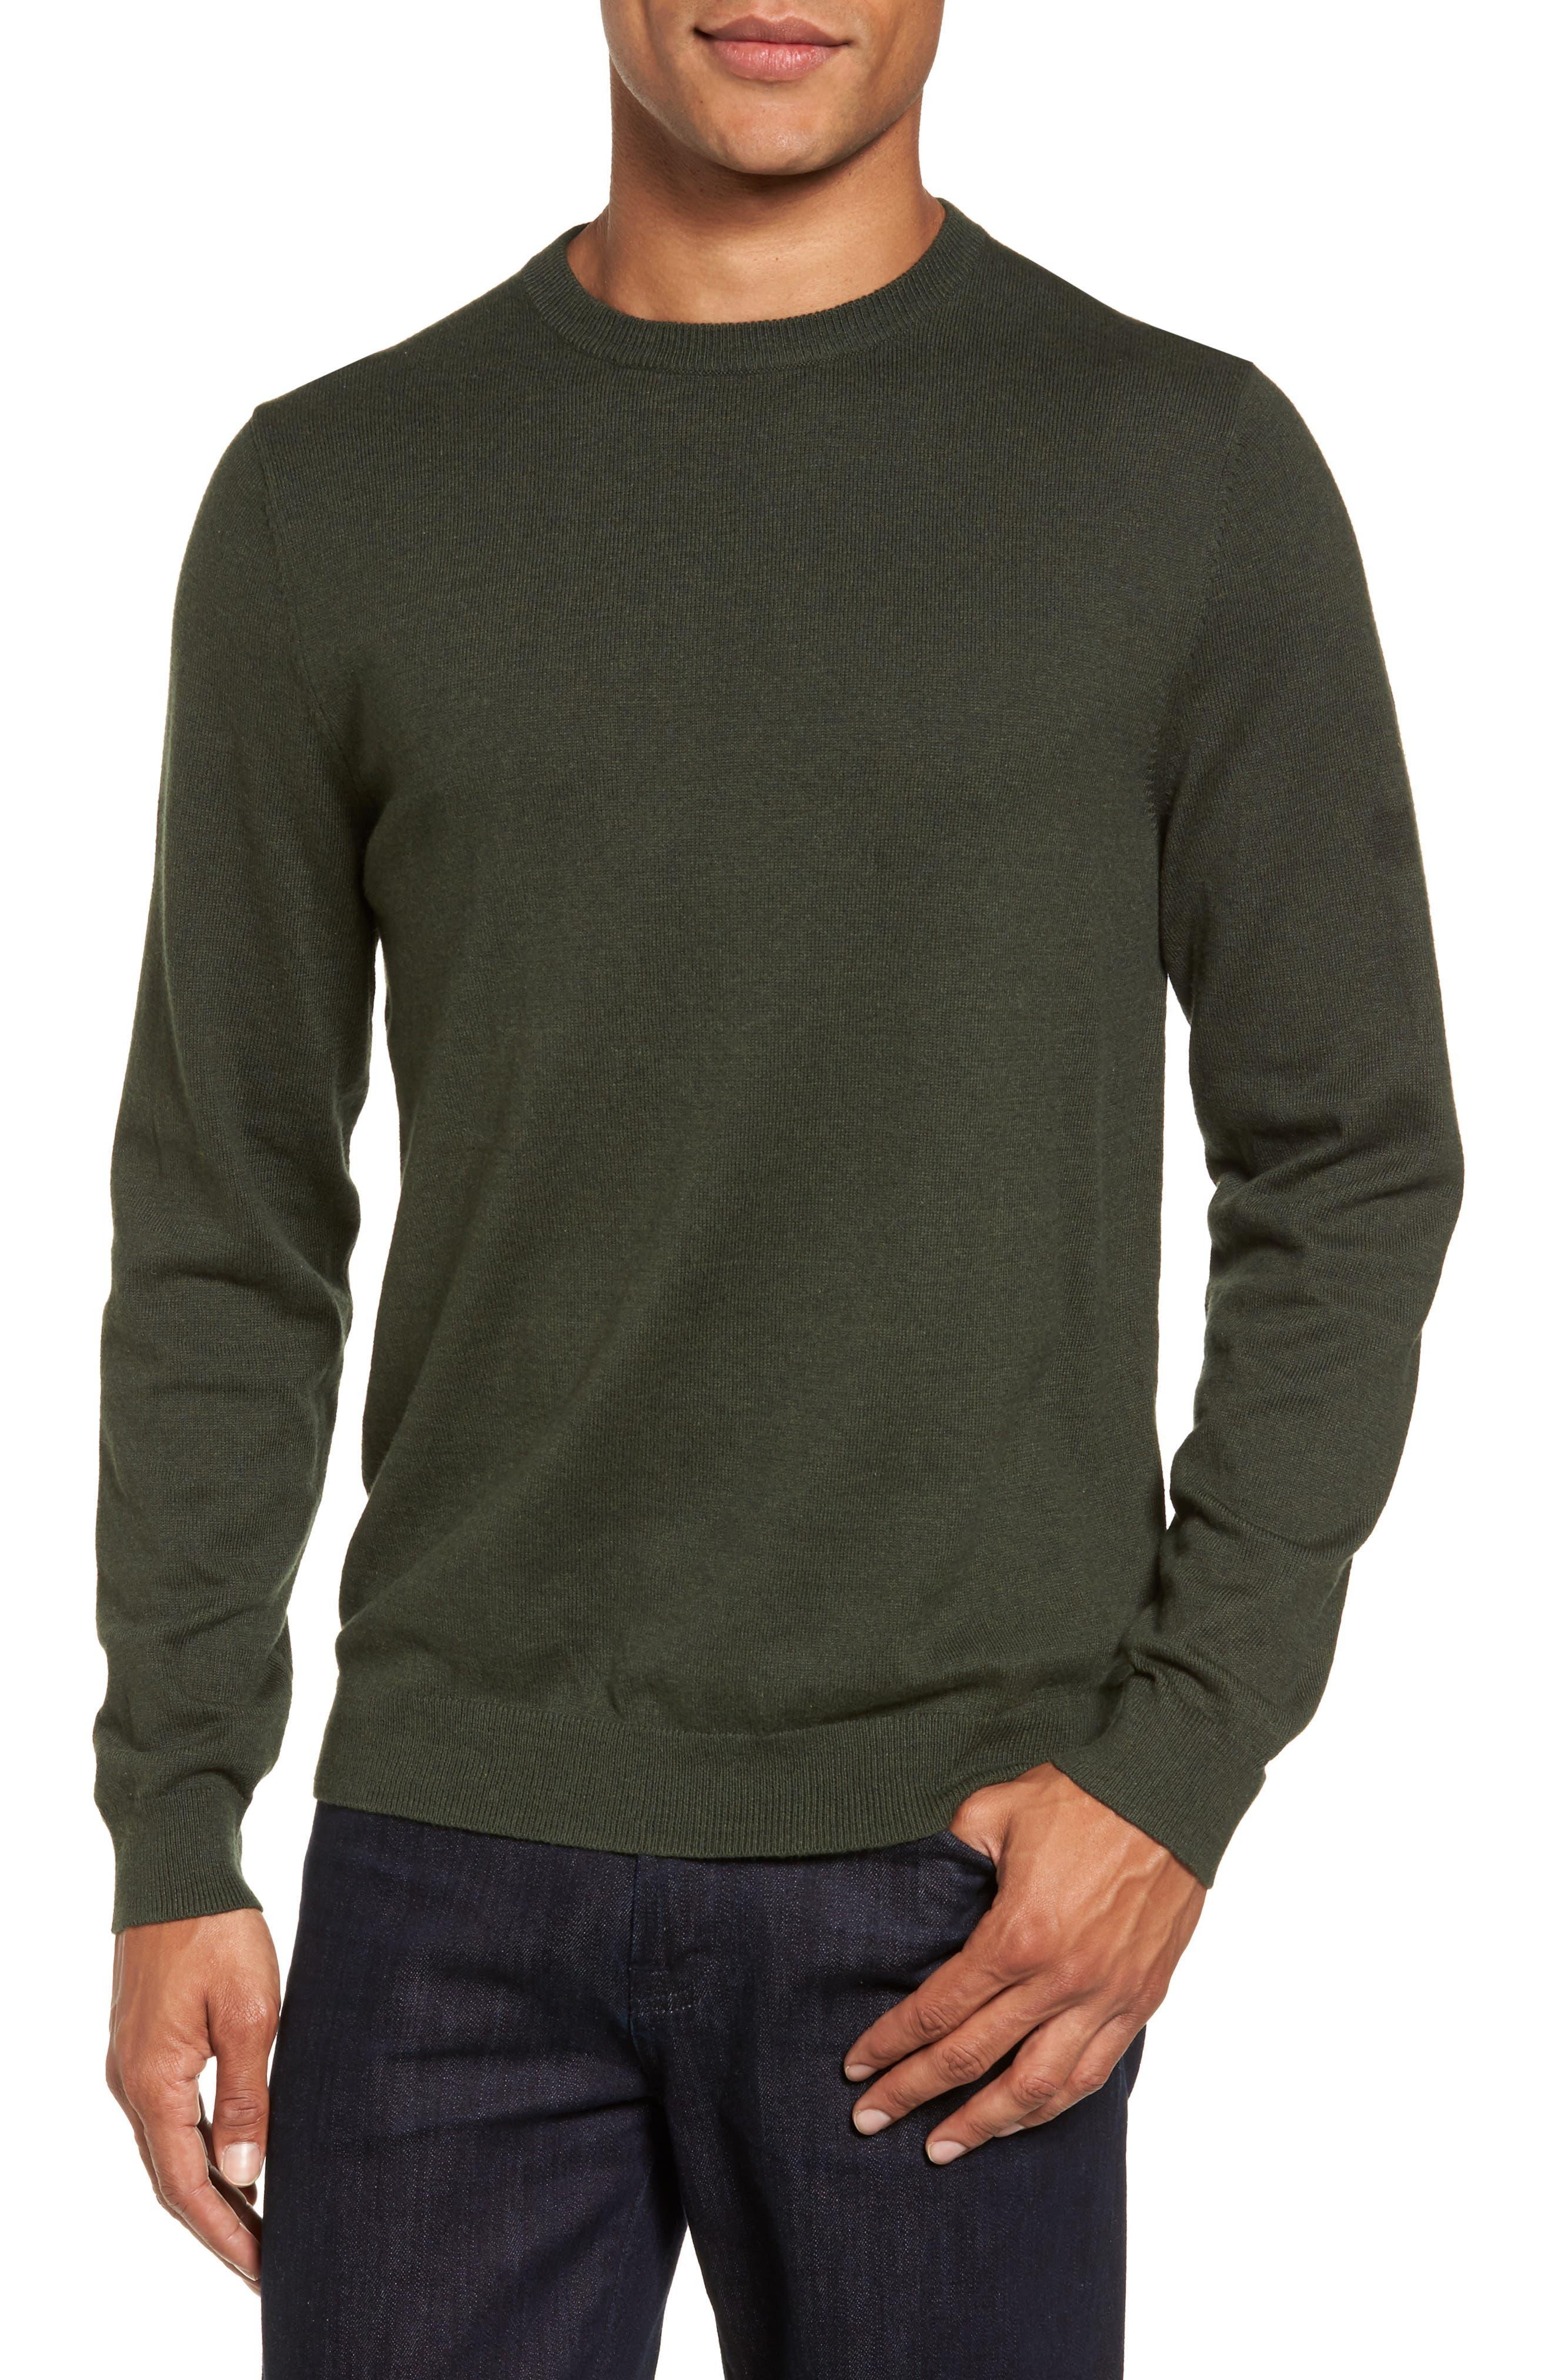 Cotton & Cashmere Crewneck Sweater,                             Main thumbnail 1, color,                             Green Deep Pine